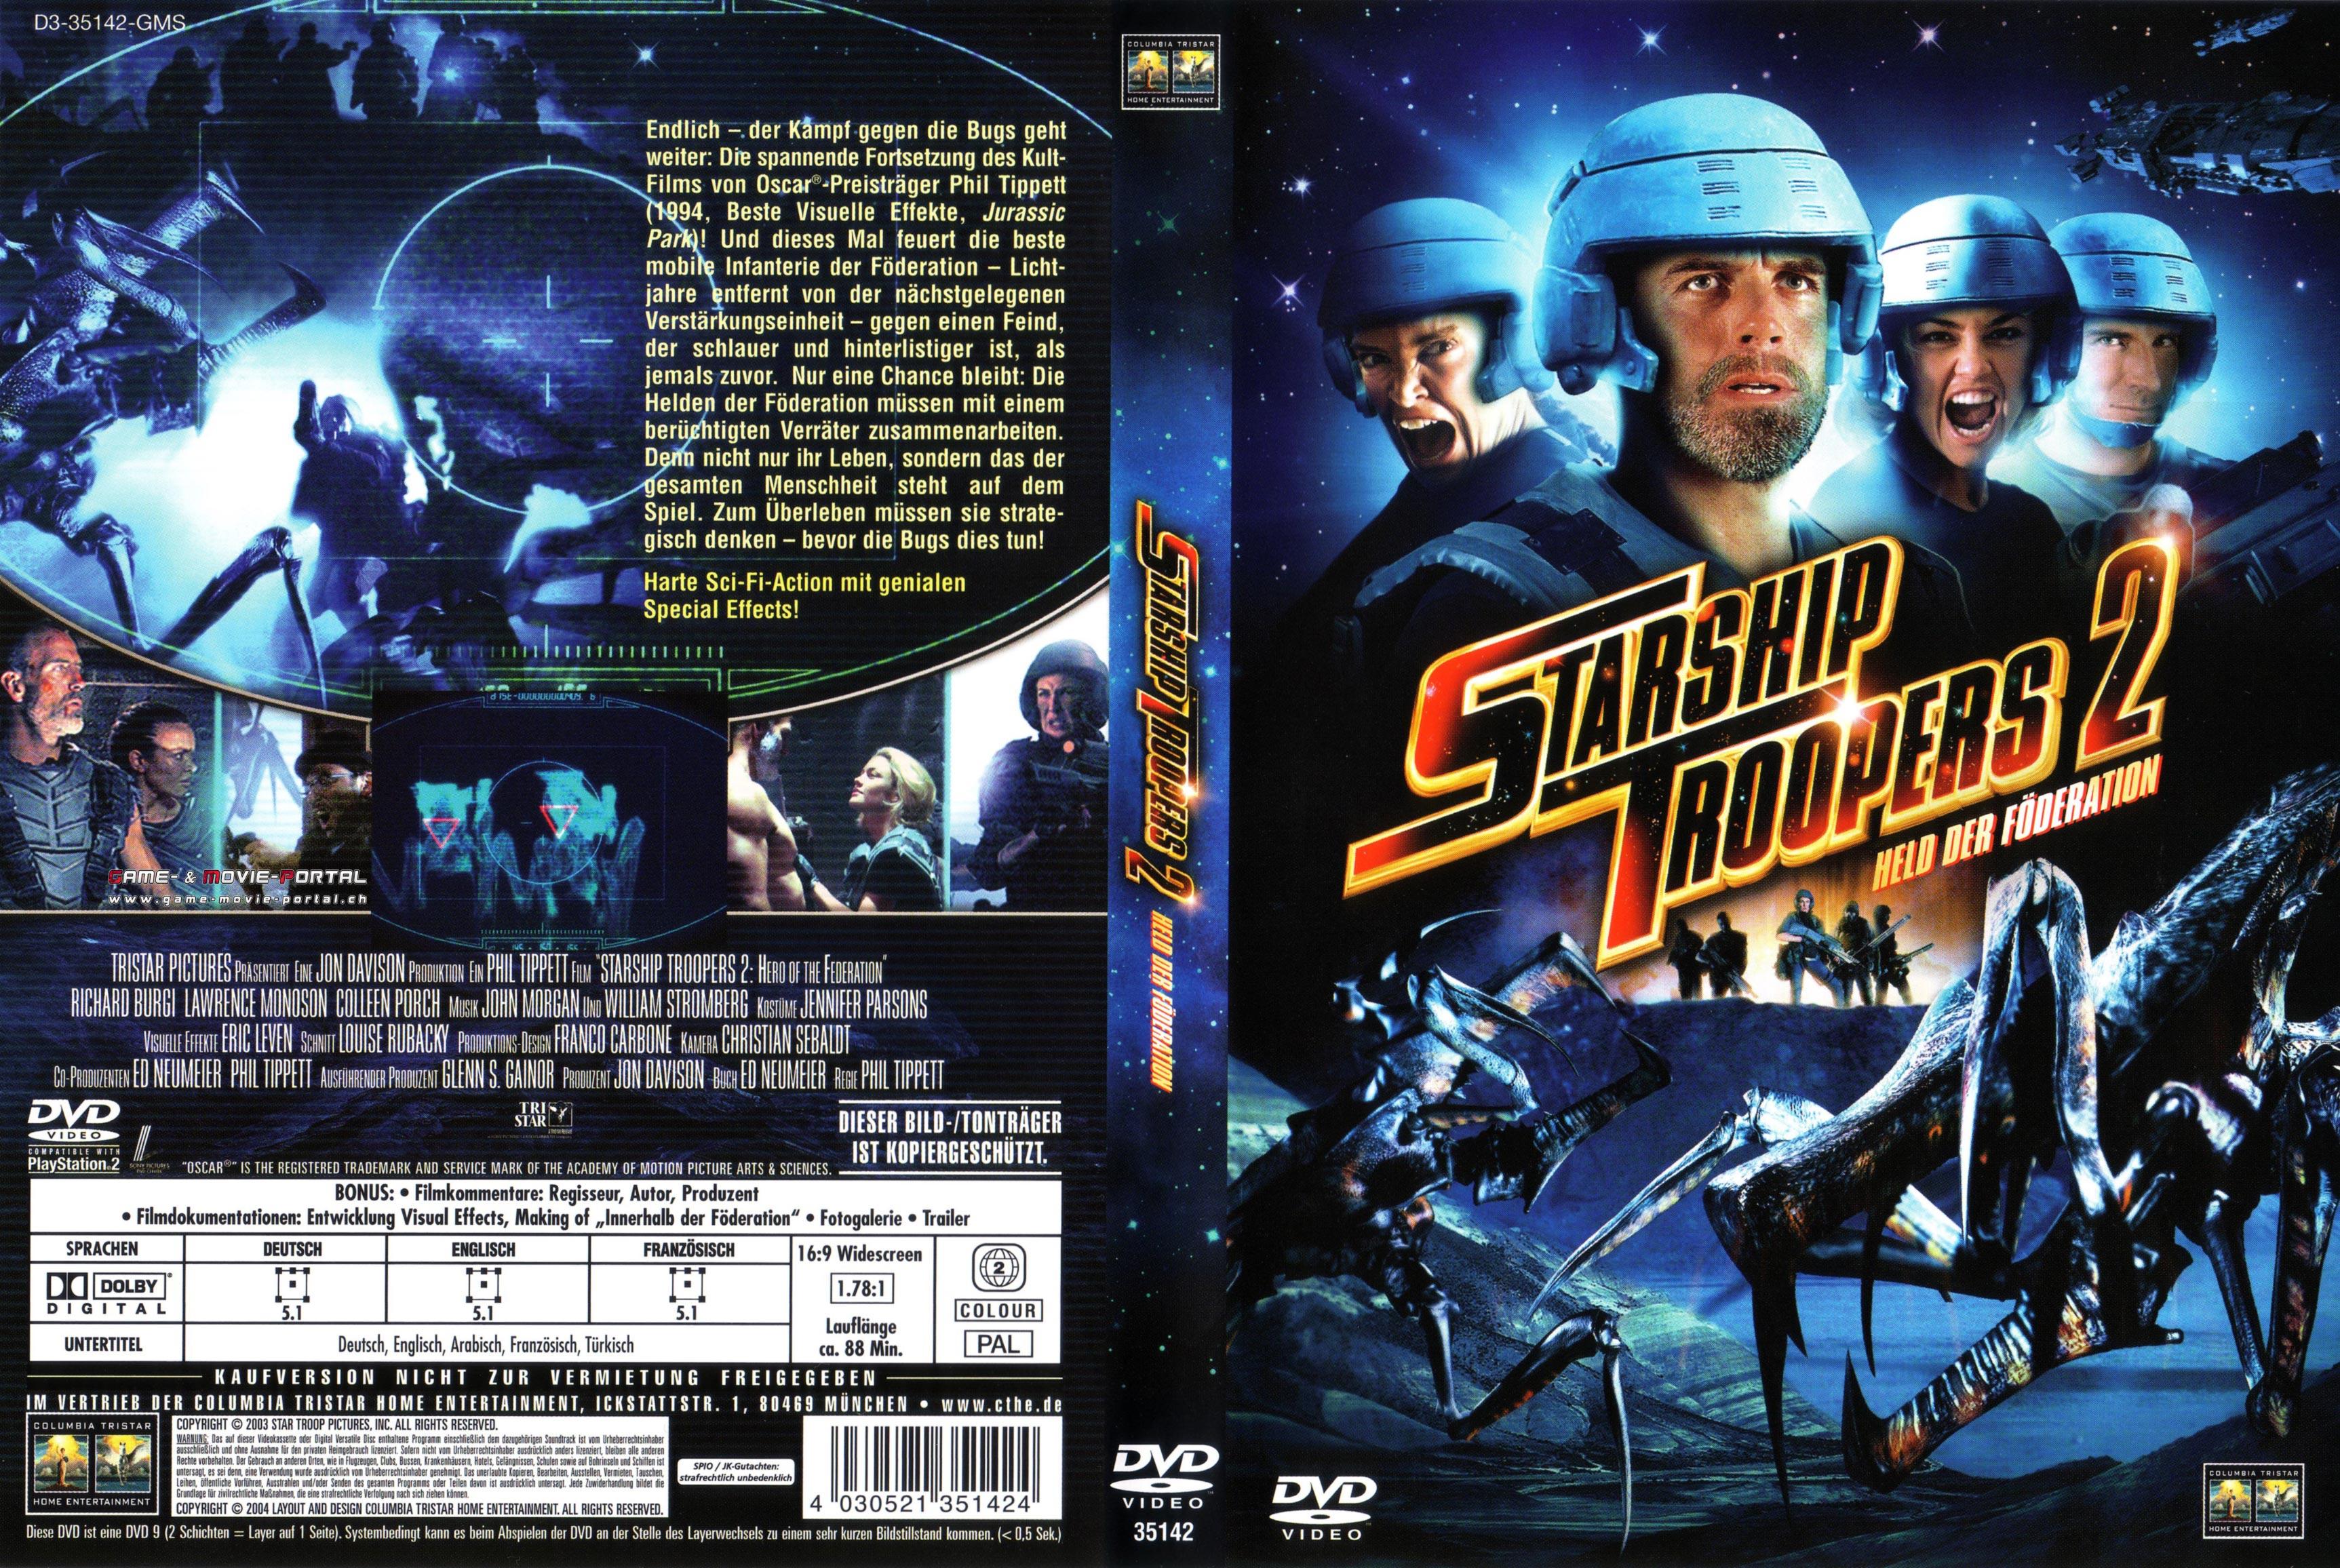 Deutsche Covers in german - Video DVD Covers auf deutsch